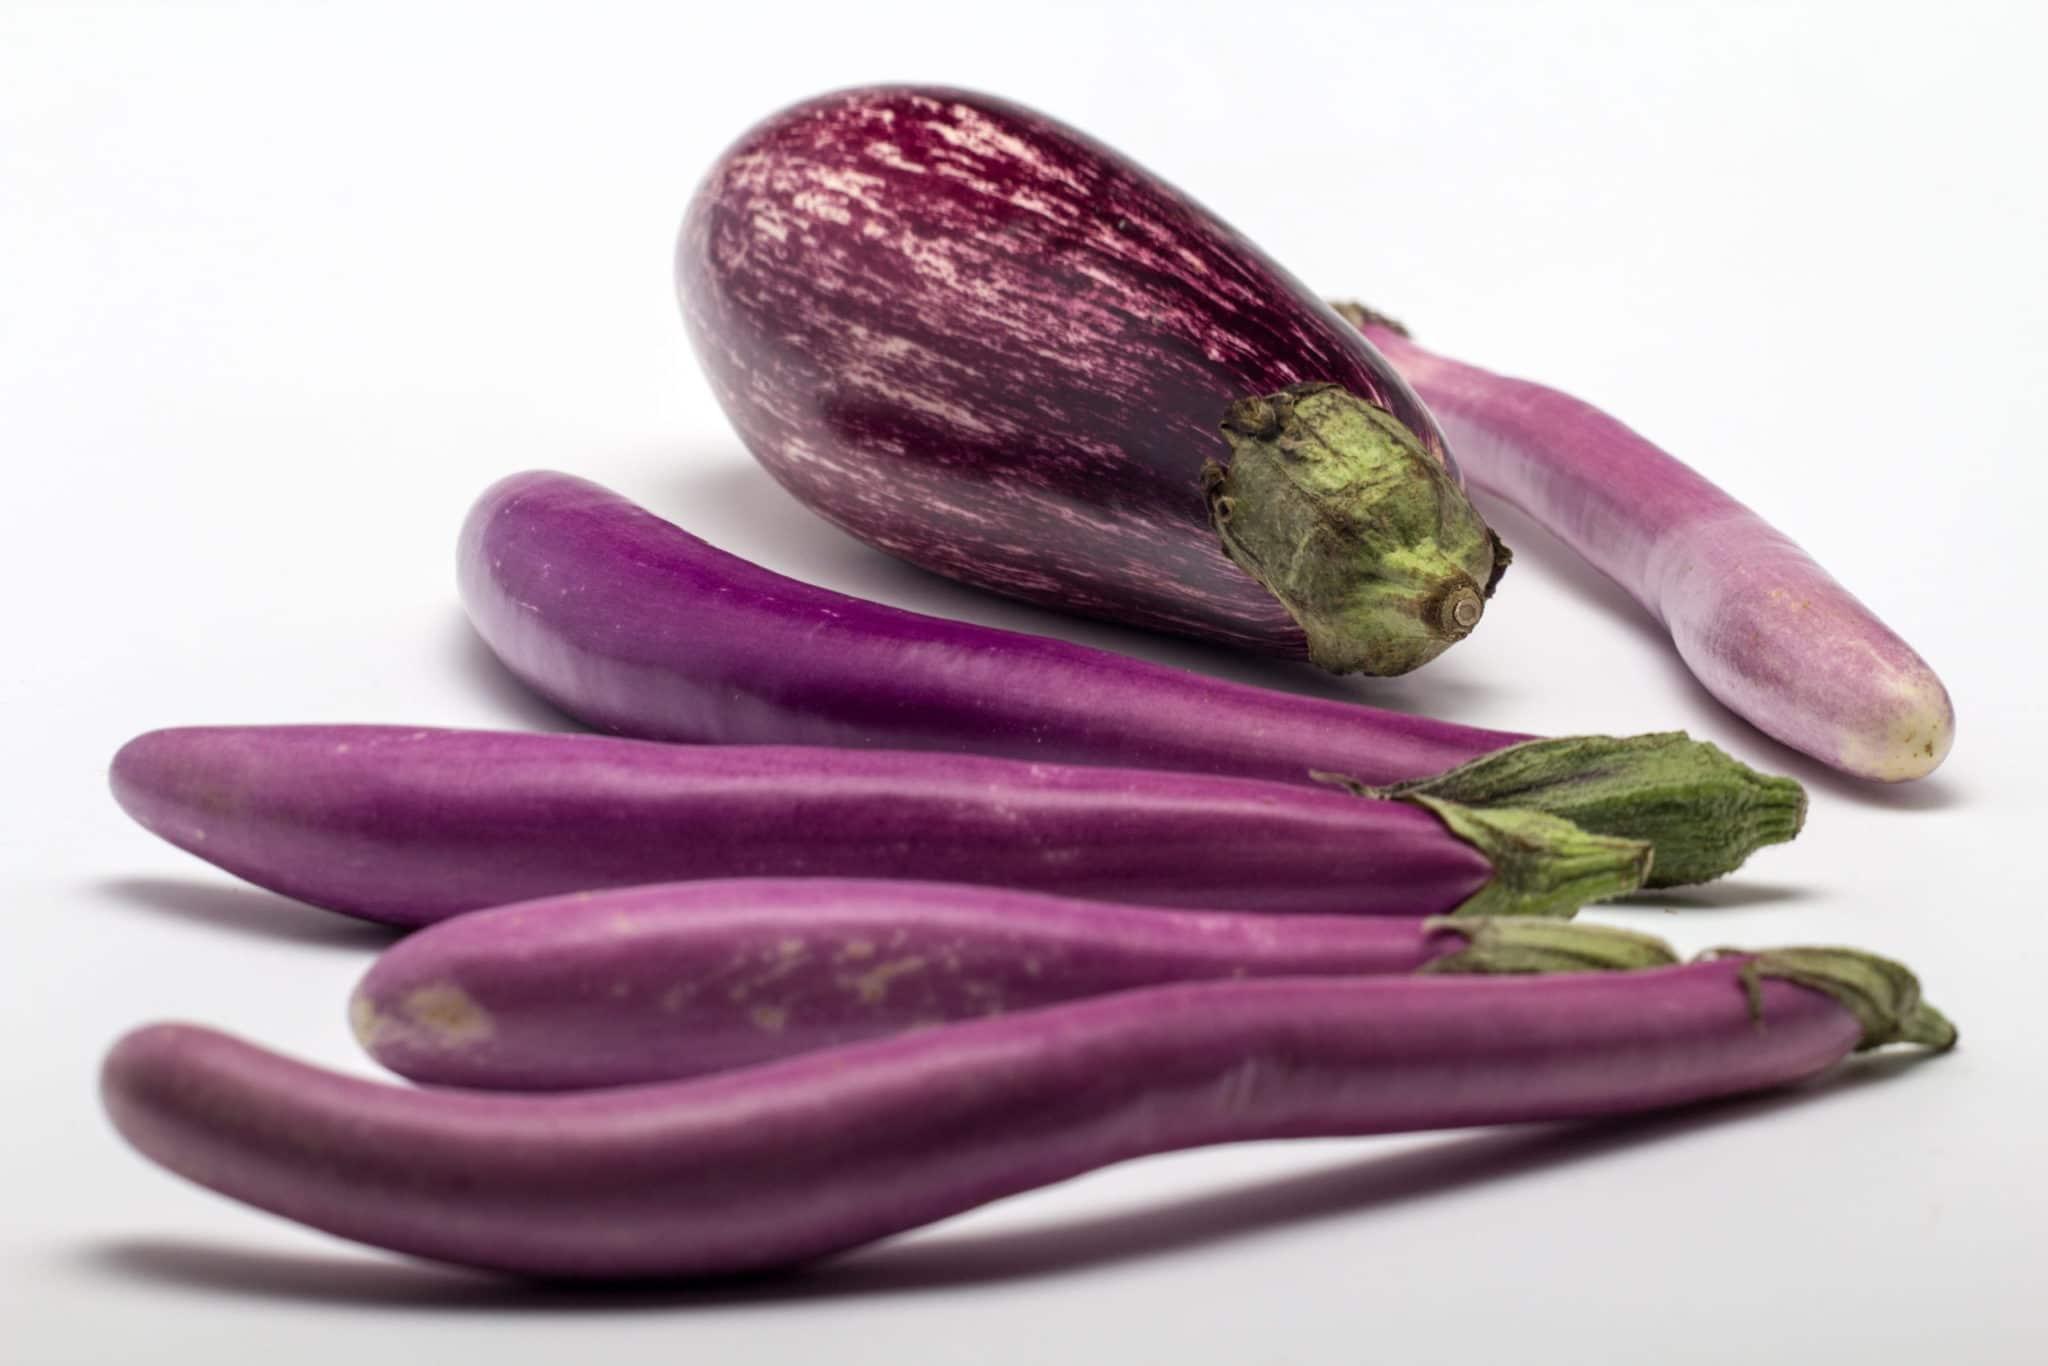 Why Drink Eggplant Juice